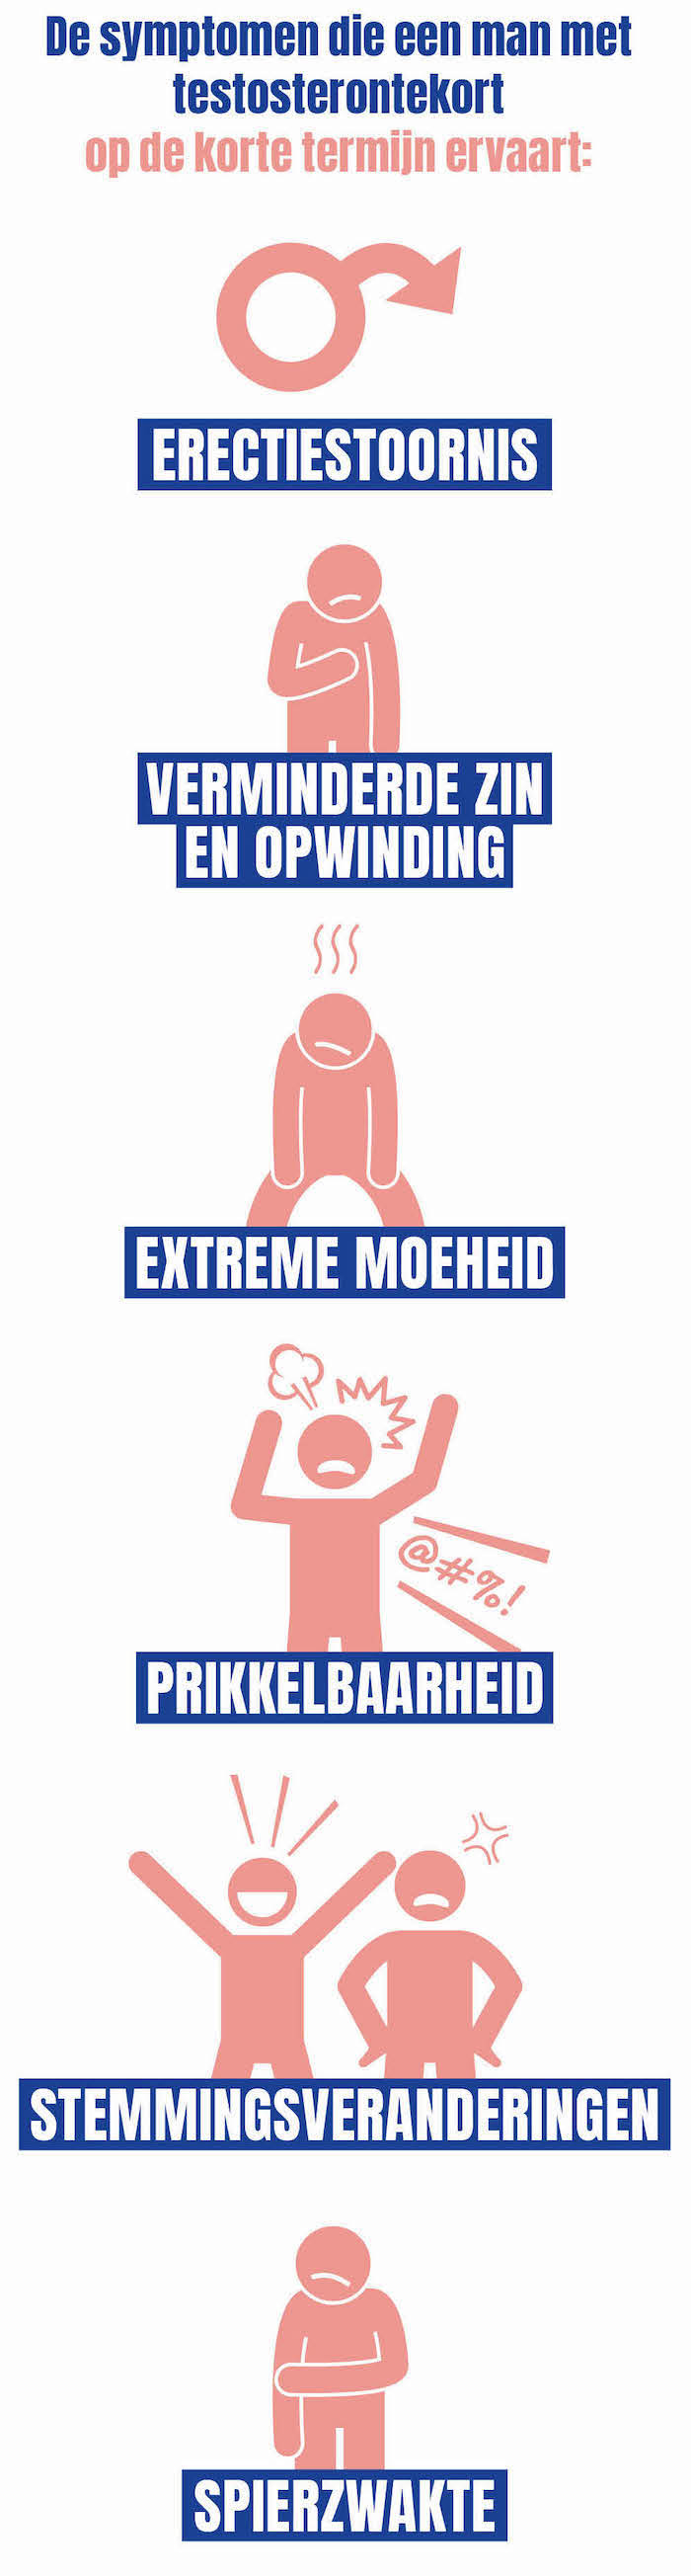 Infographic testosterontekort: erectiestoornis, verminderde zin en opwinding, extreme moeheid, prikkelbaarheid, stemmingsveranderingen en spierzwakte.